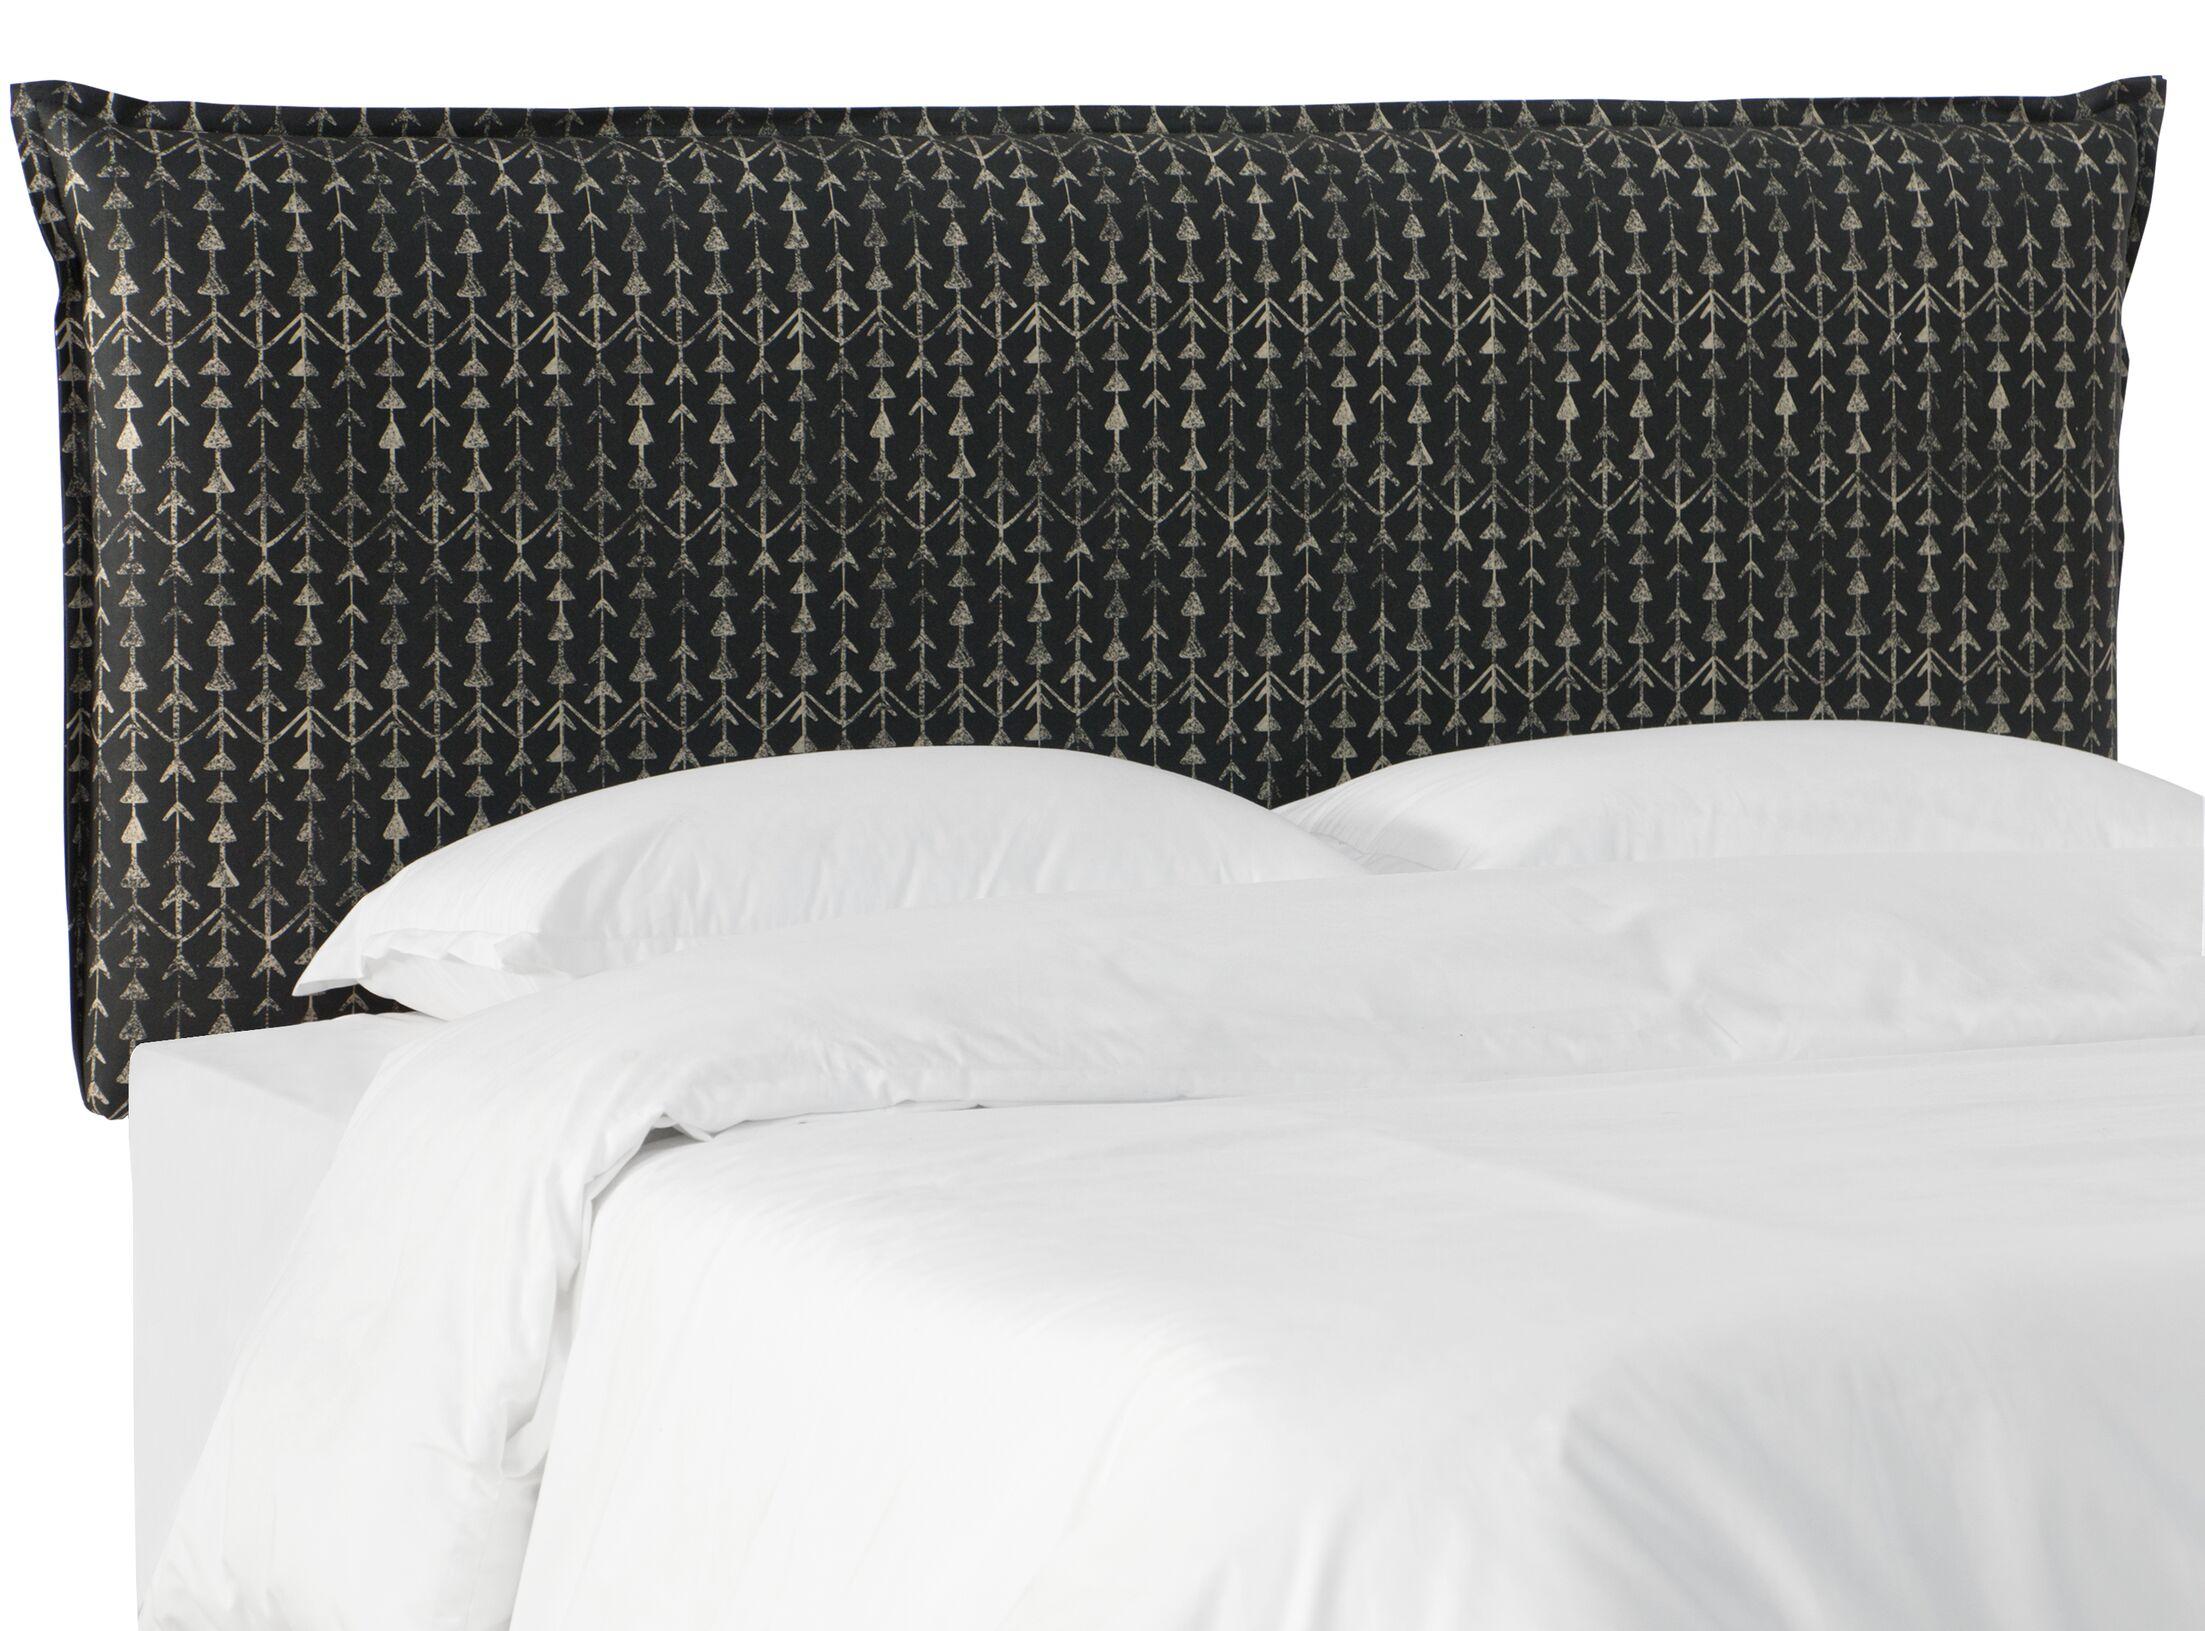 Woodlake Upholstered Panel Headboard in Arrow Stripe Ink Size: King